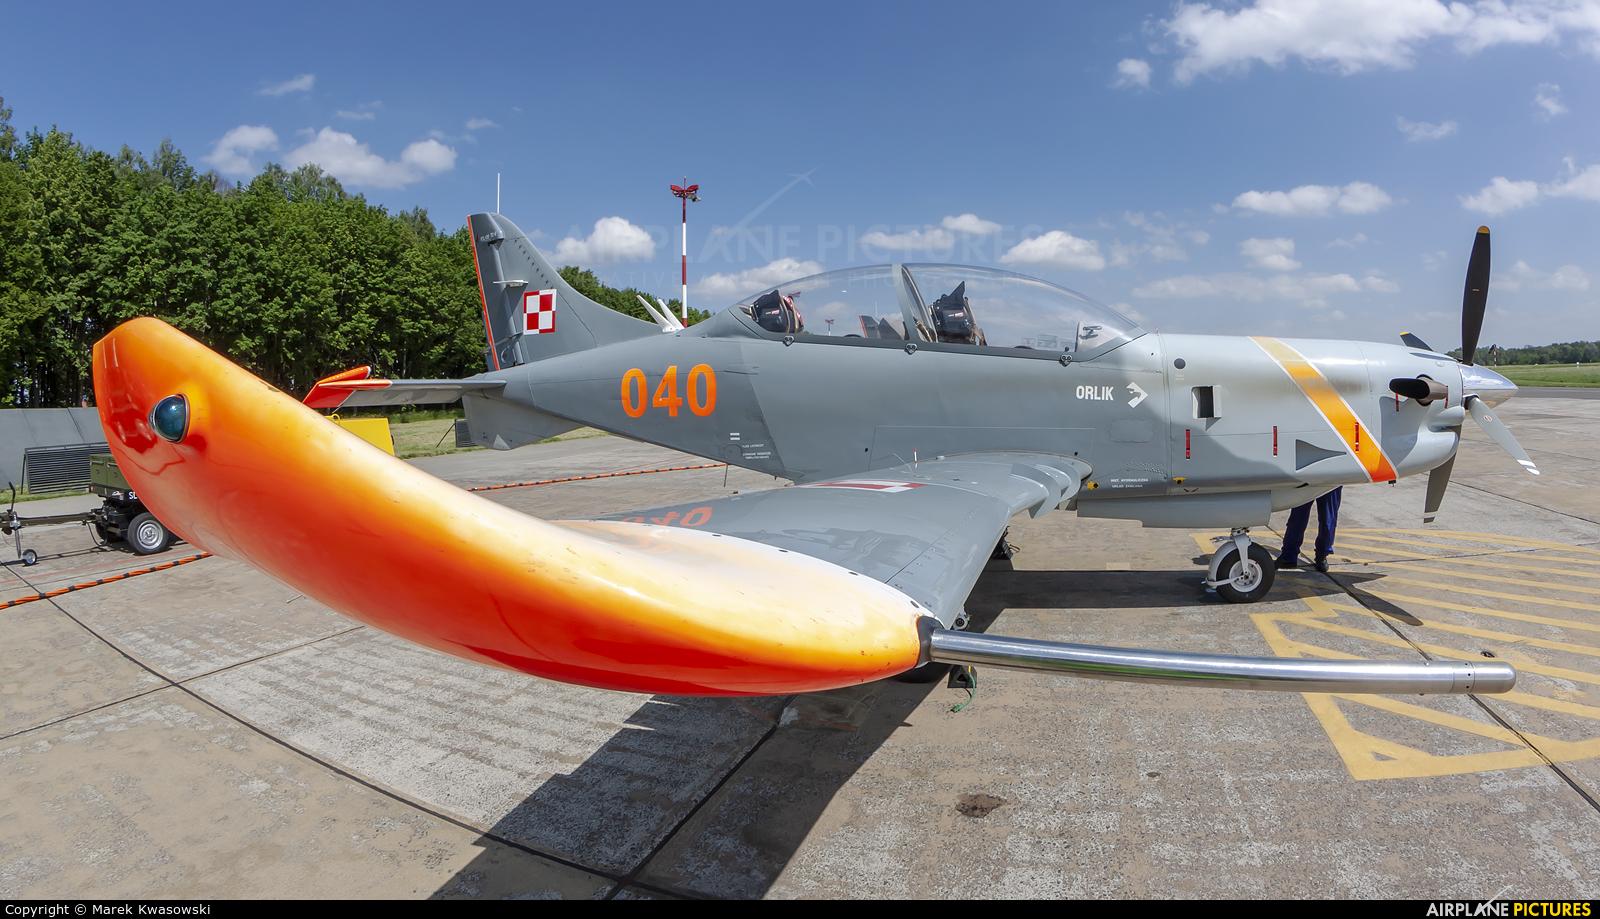 "Poland - Air Force ""Orlik Acrobatic Group"" 040 aircraft at Radom - Sadków"